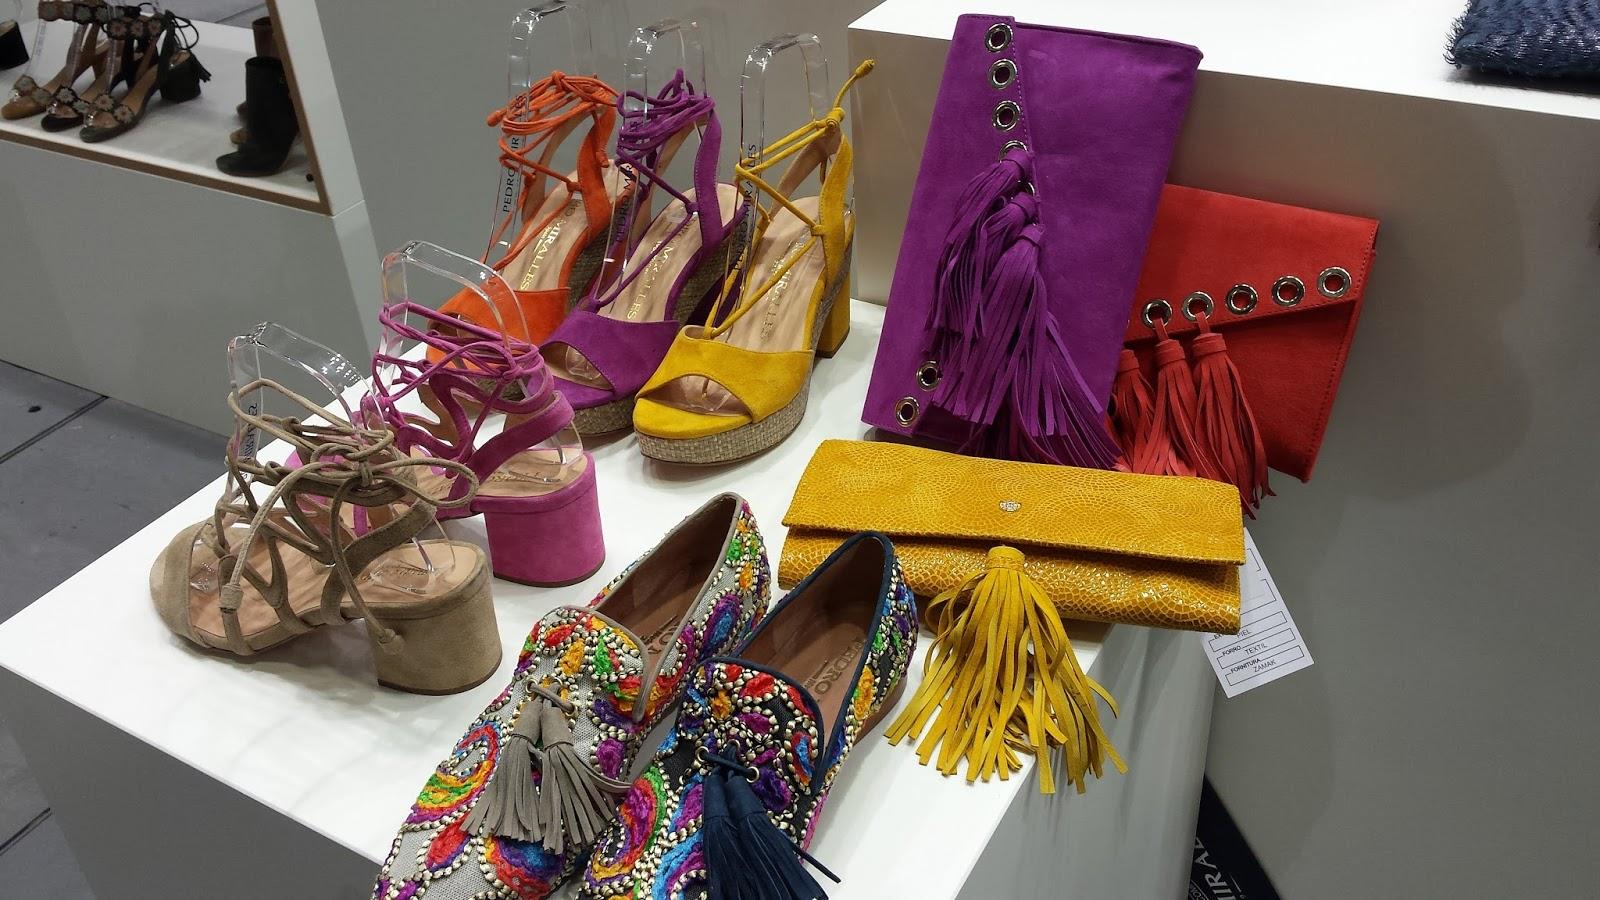 Berlin Fashion Week, Panorama Berlin, Pedro Miralles, hiszpańska marka, hiszpańskie buty, moda hiszpańska